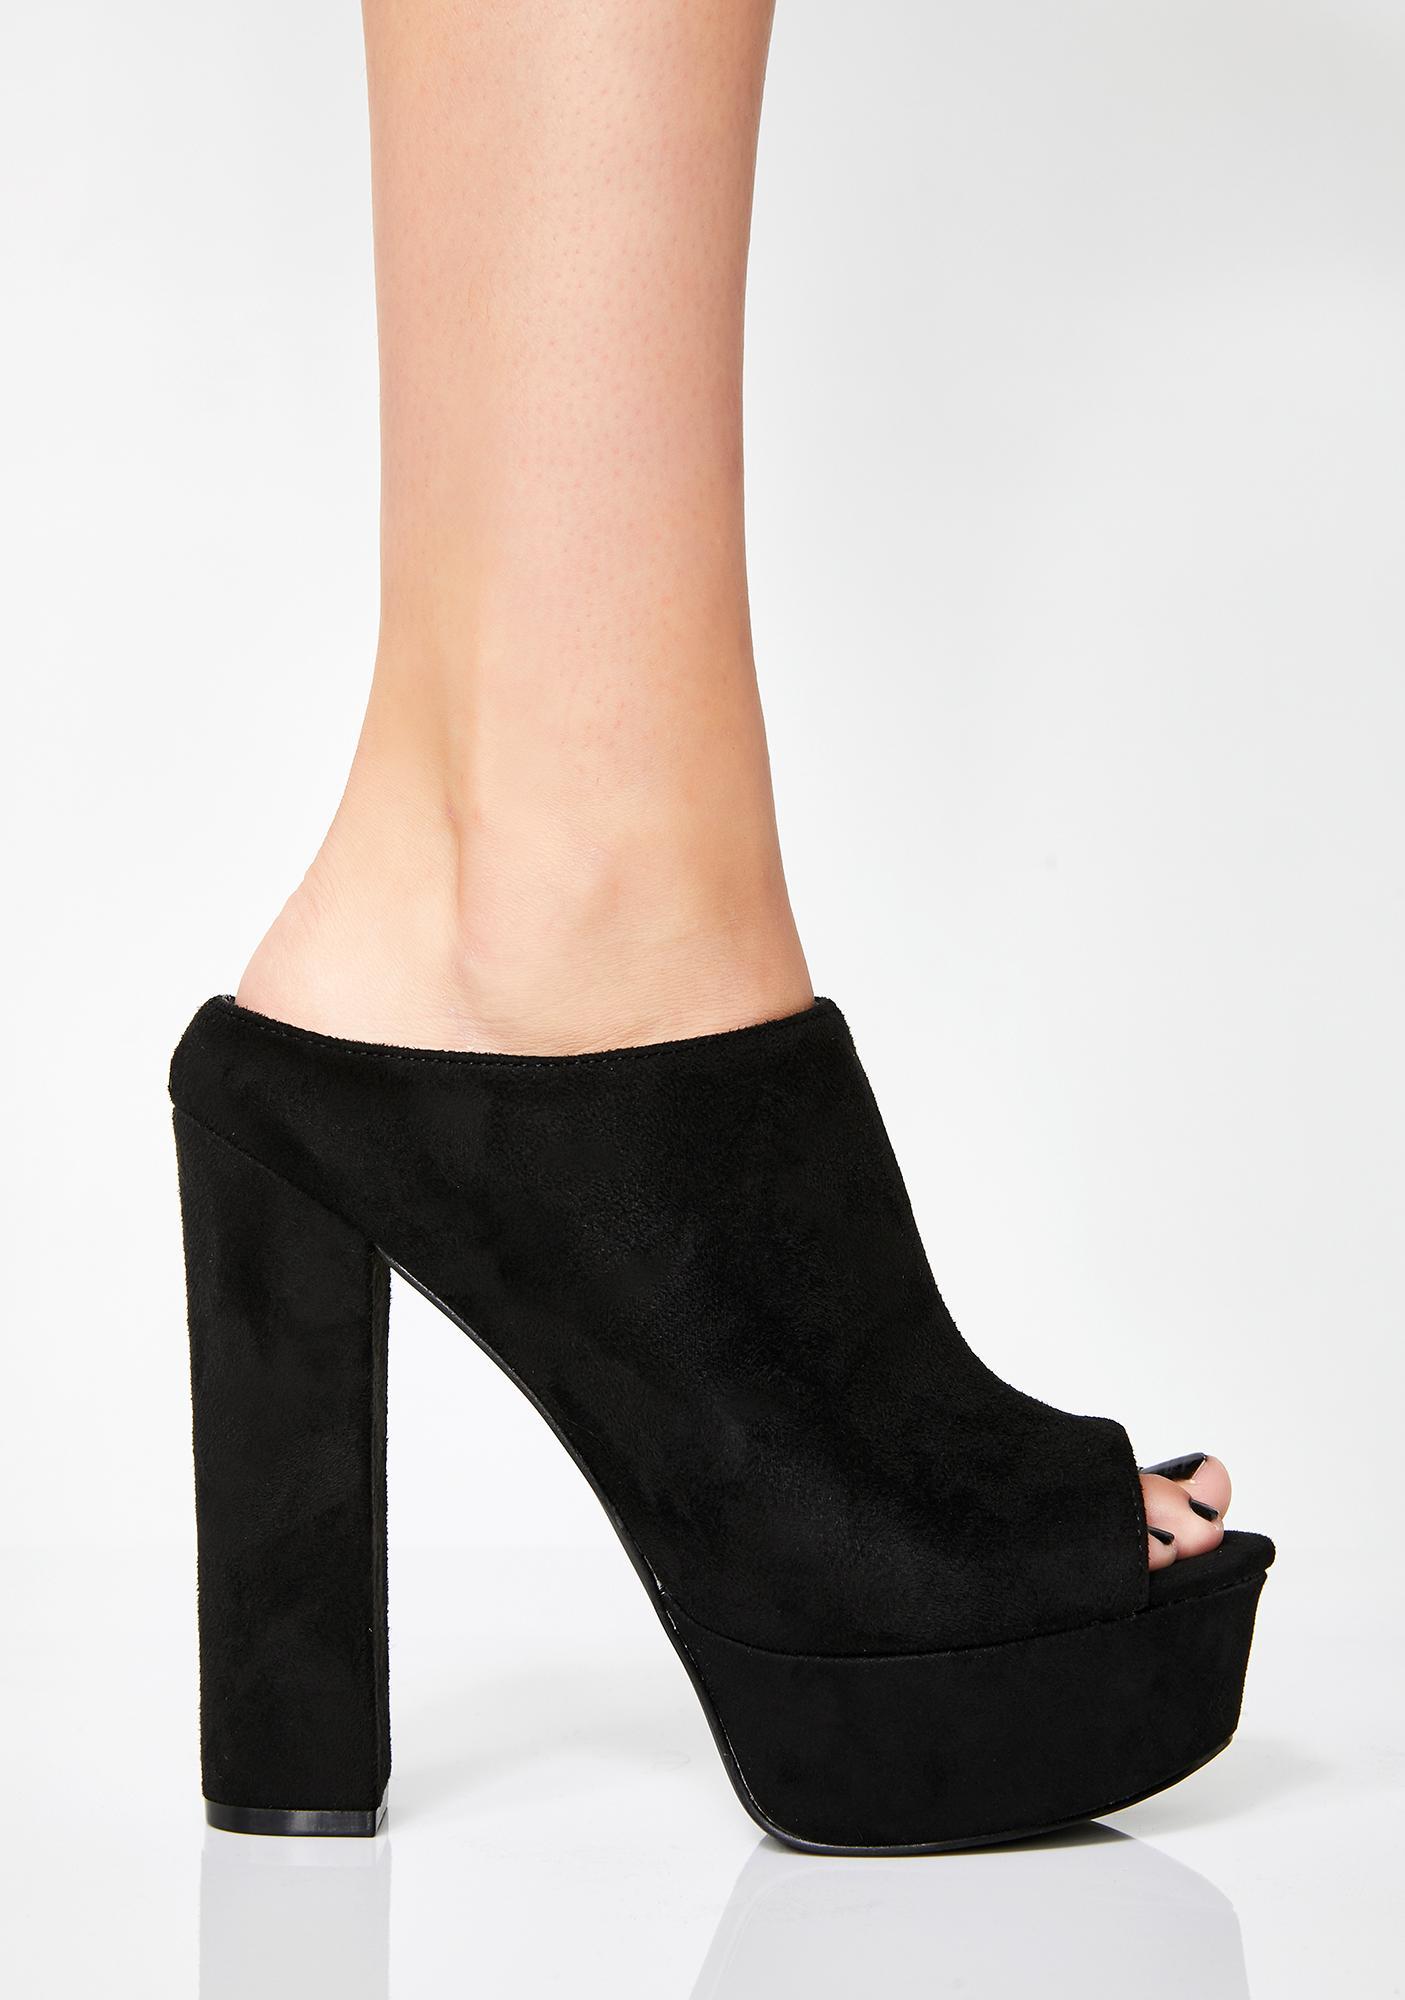 Sissy That Walk Platform Heels